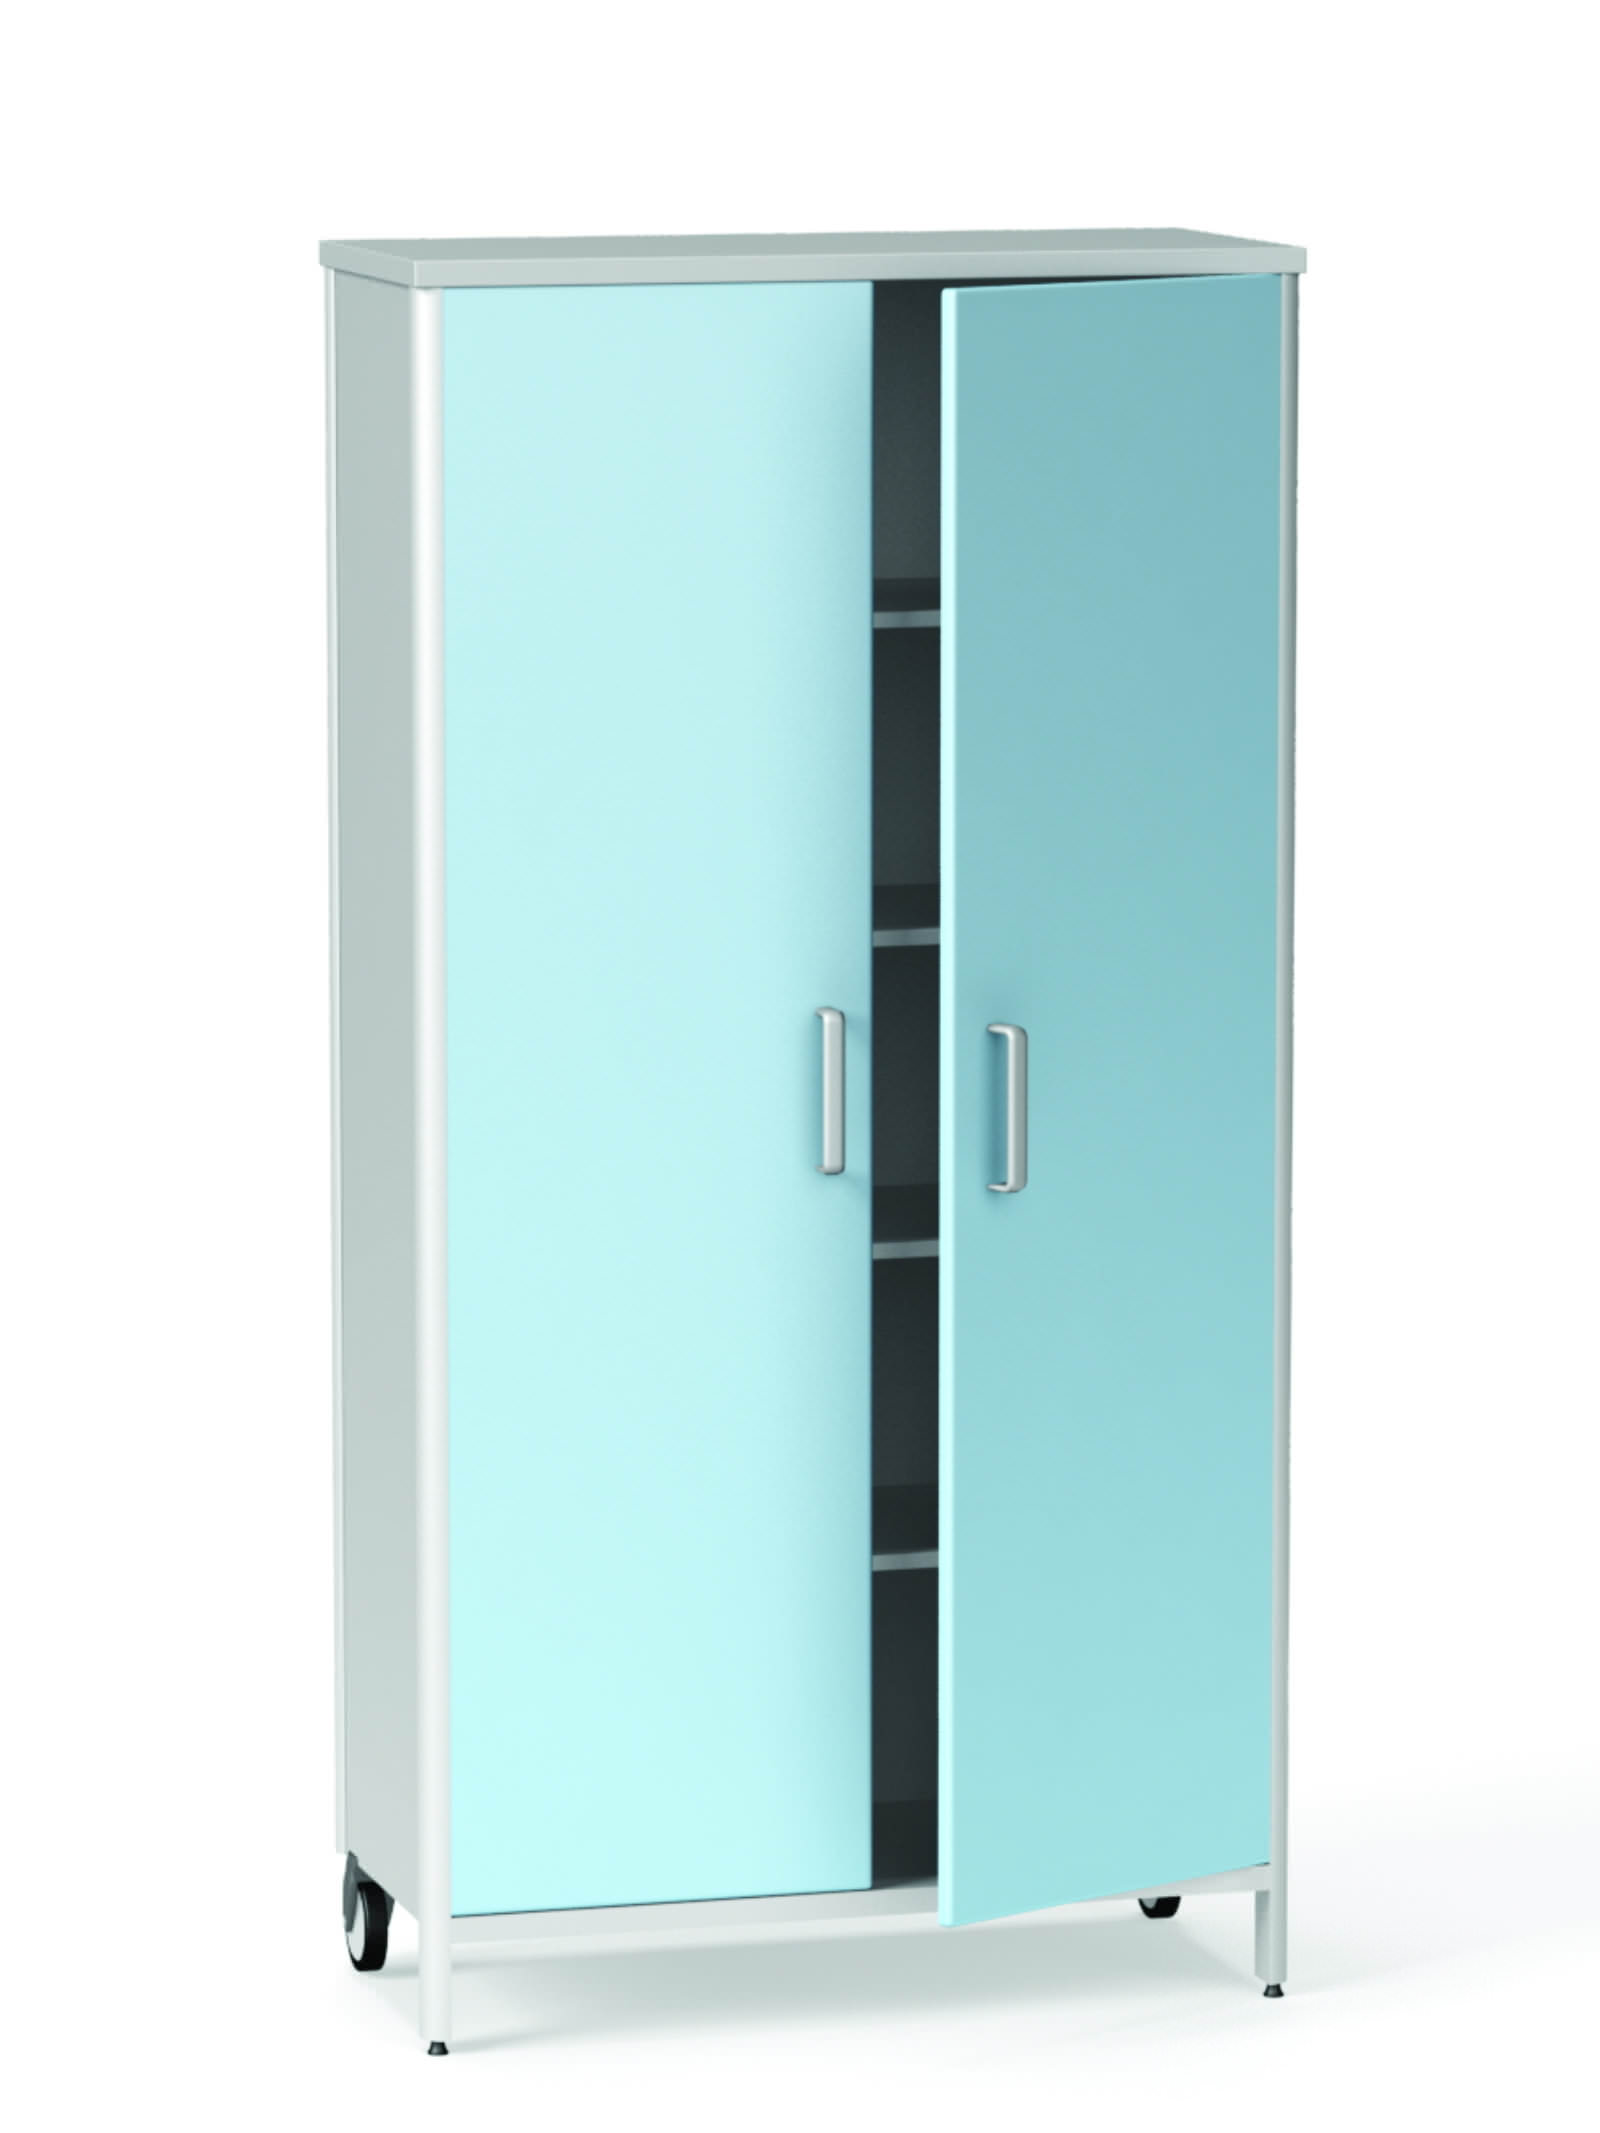 Медицинский шкаф ДМ-3-001-16